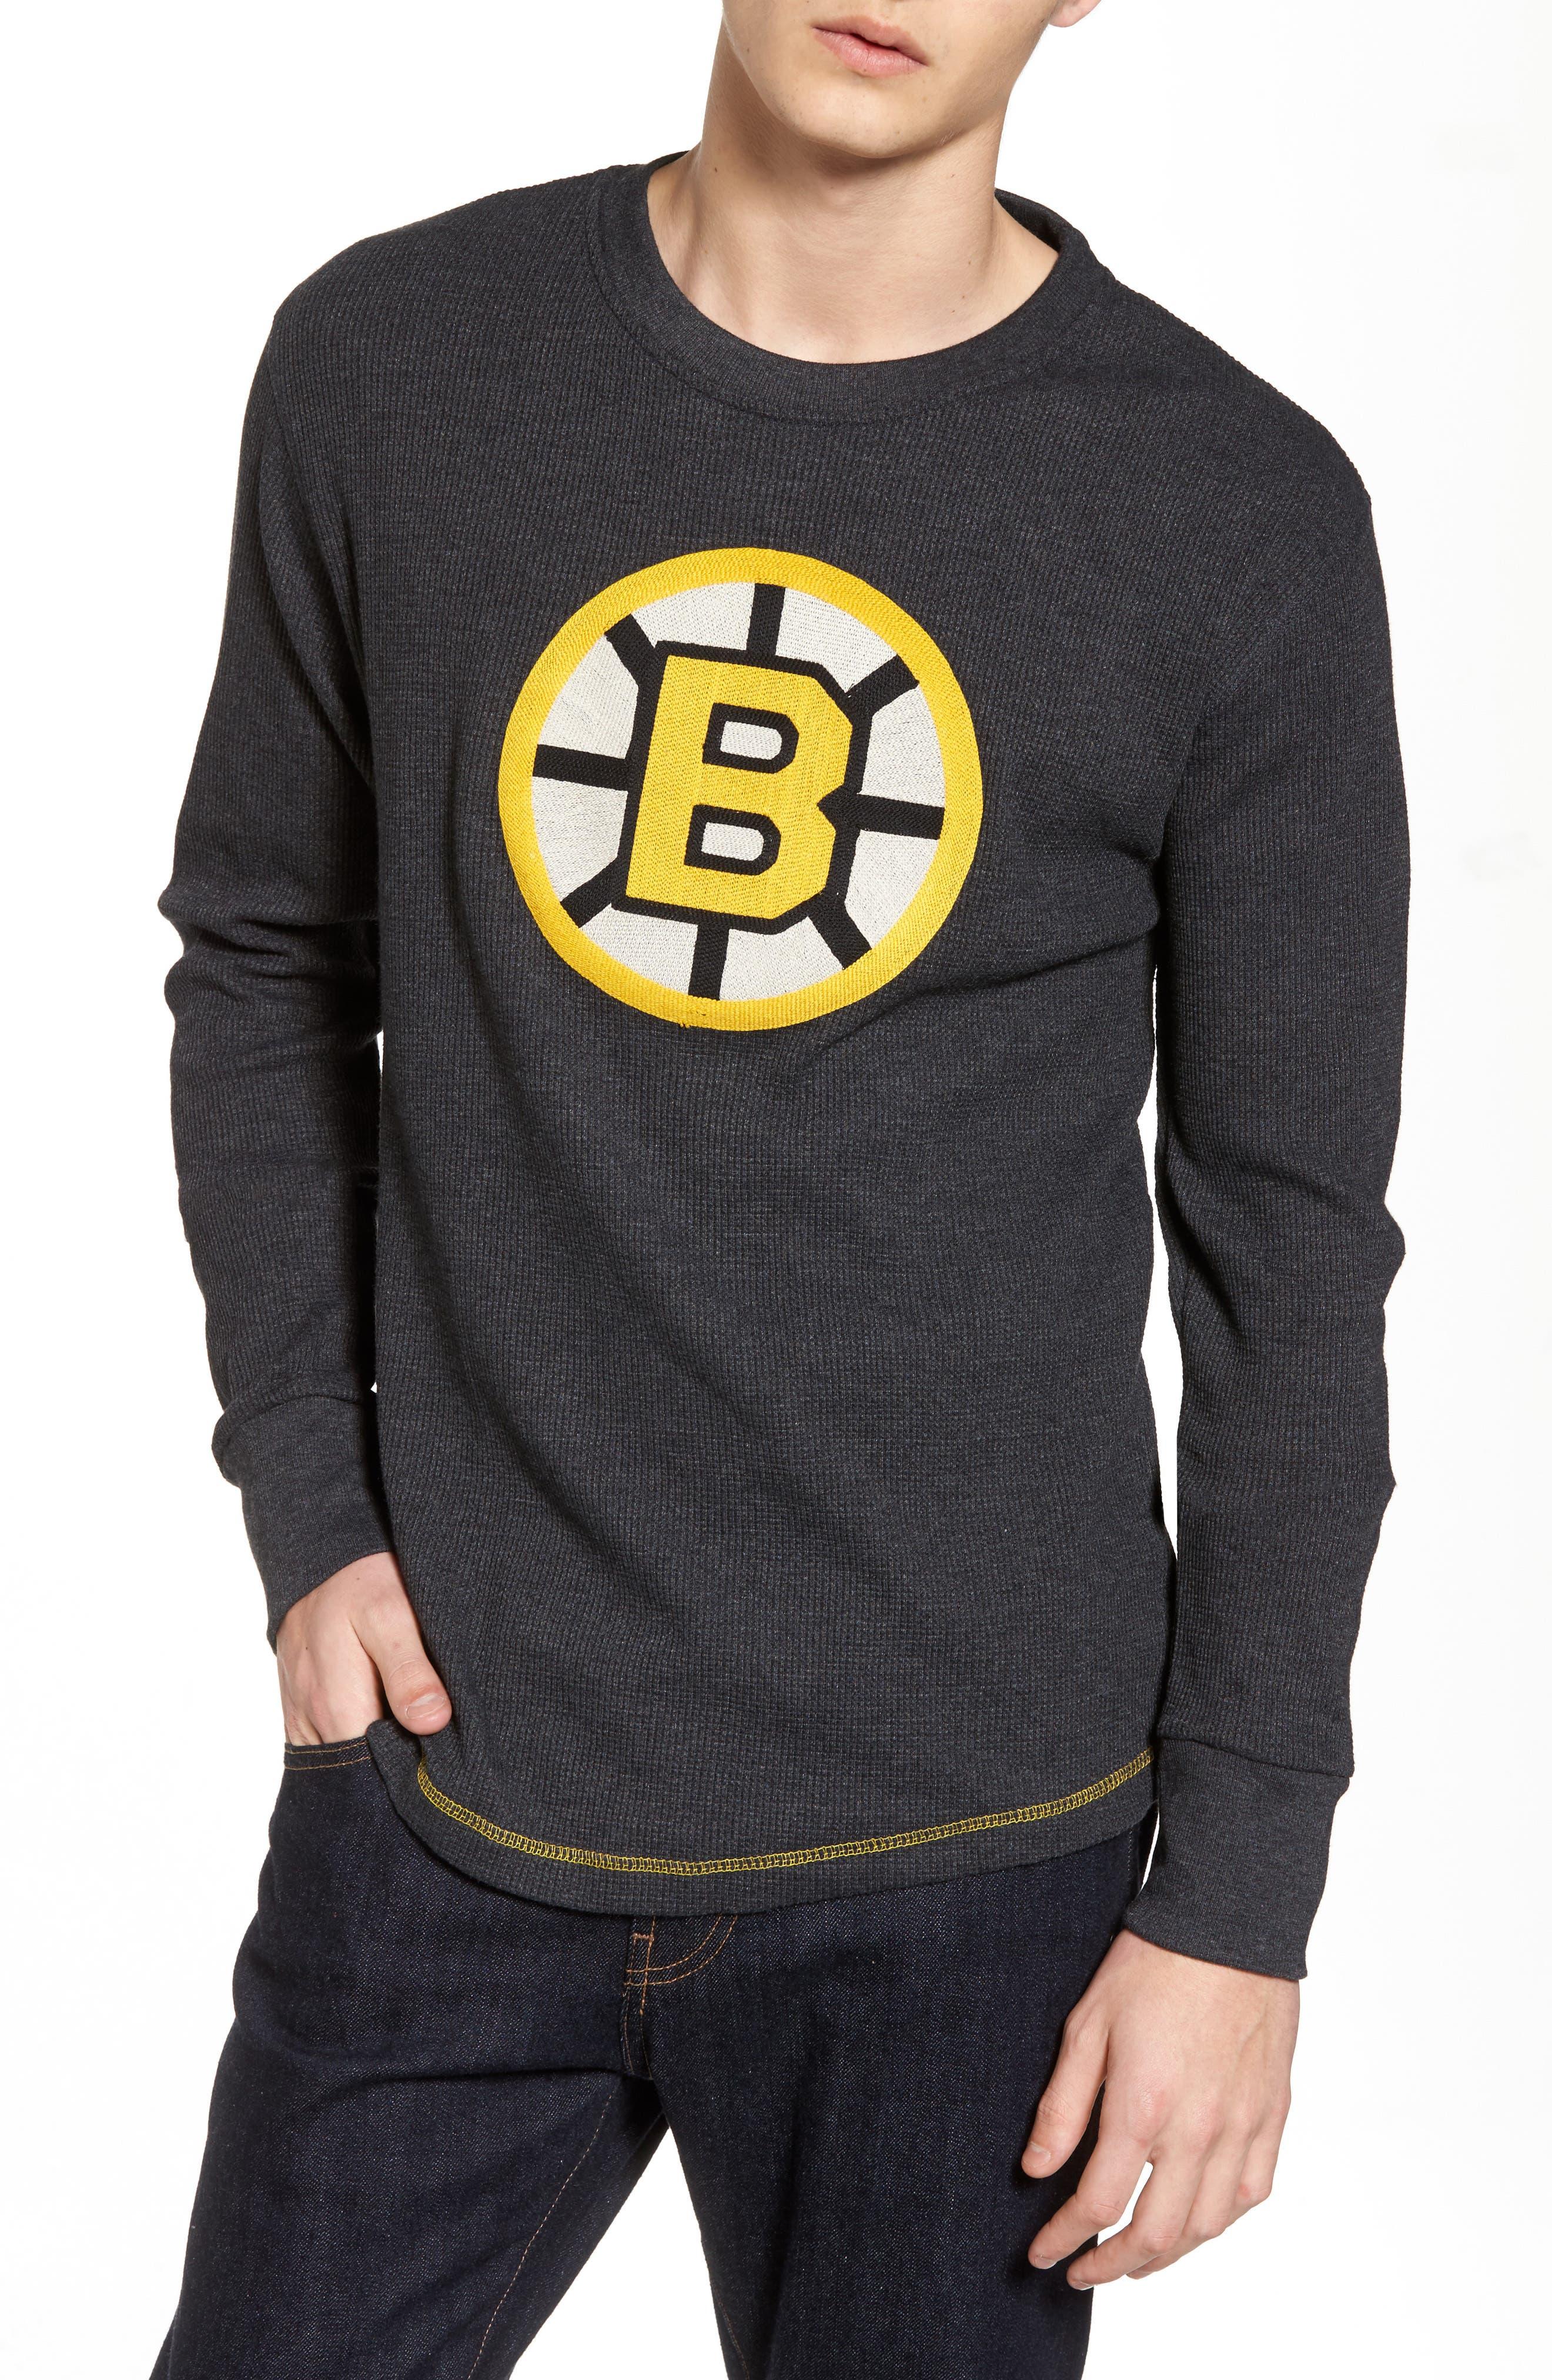 Boston Bruins Embroidered Long Sleeve Thermal Shirt,                             Main thumbnail 1, color,                             Black